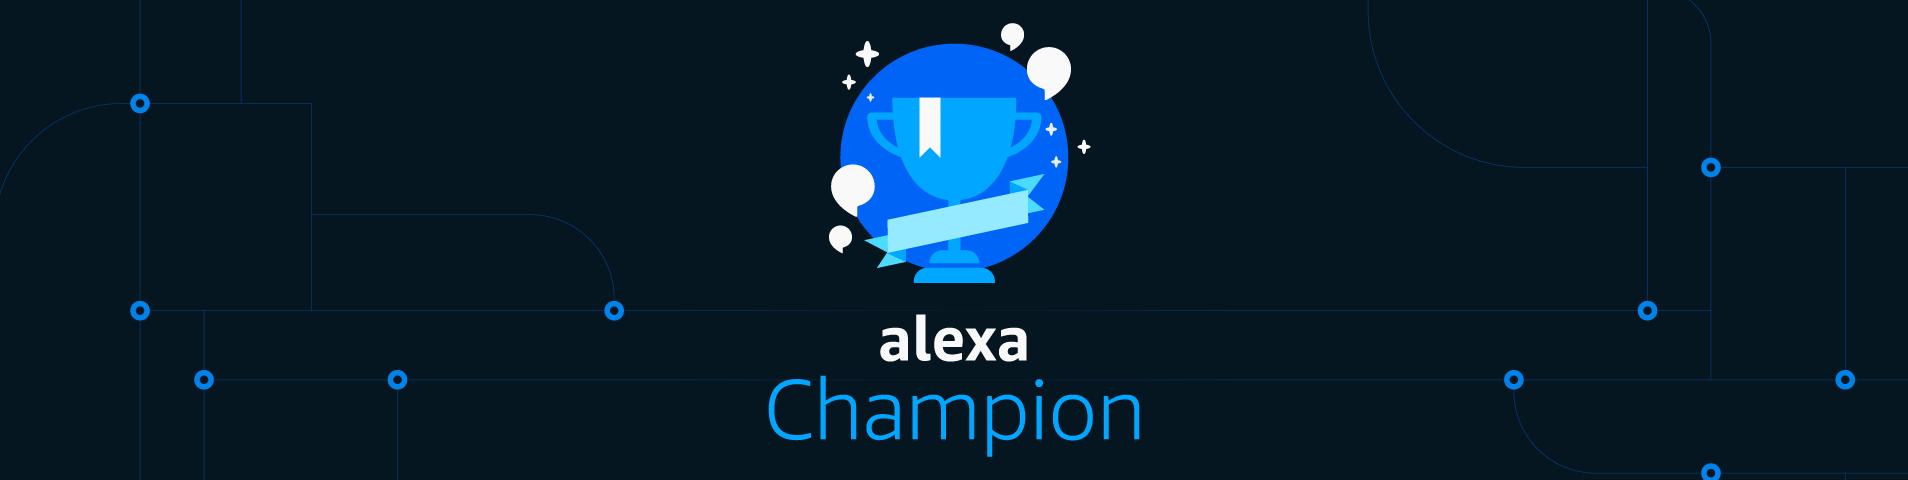 Alexa Champions Logo